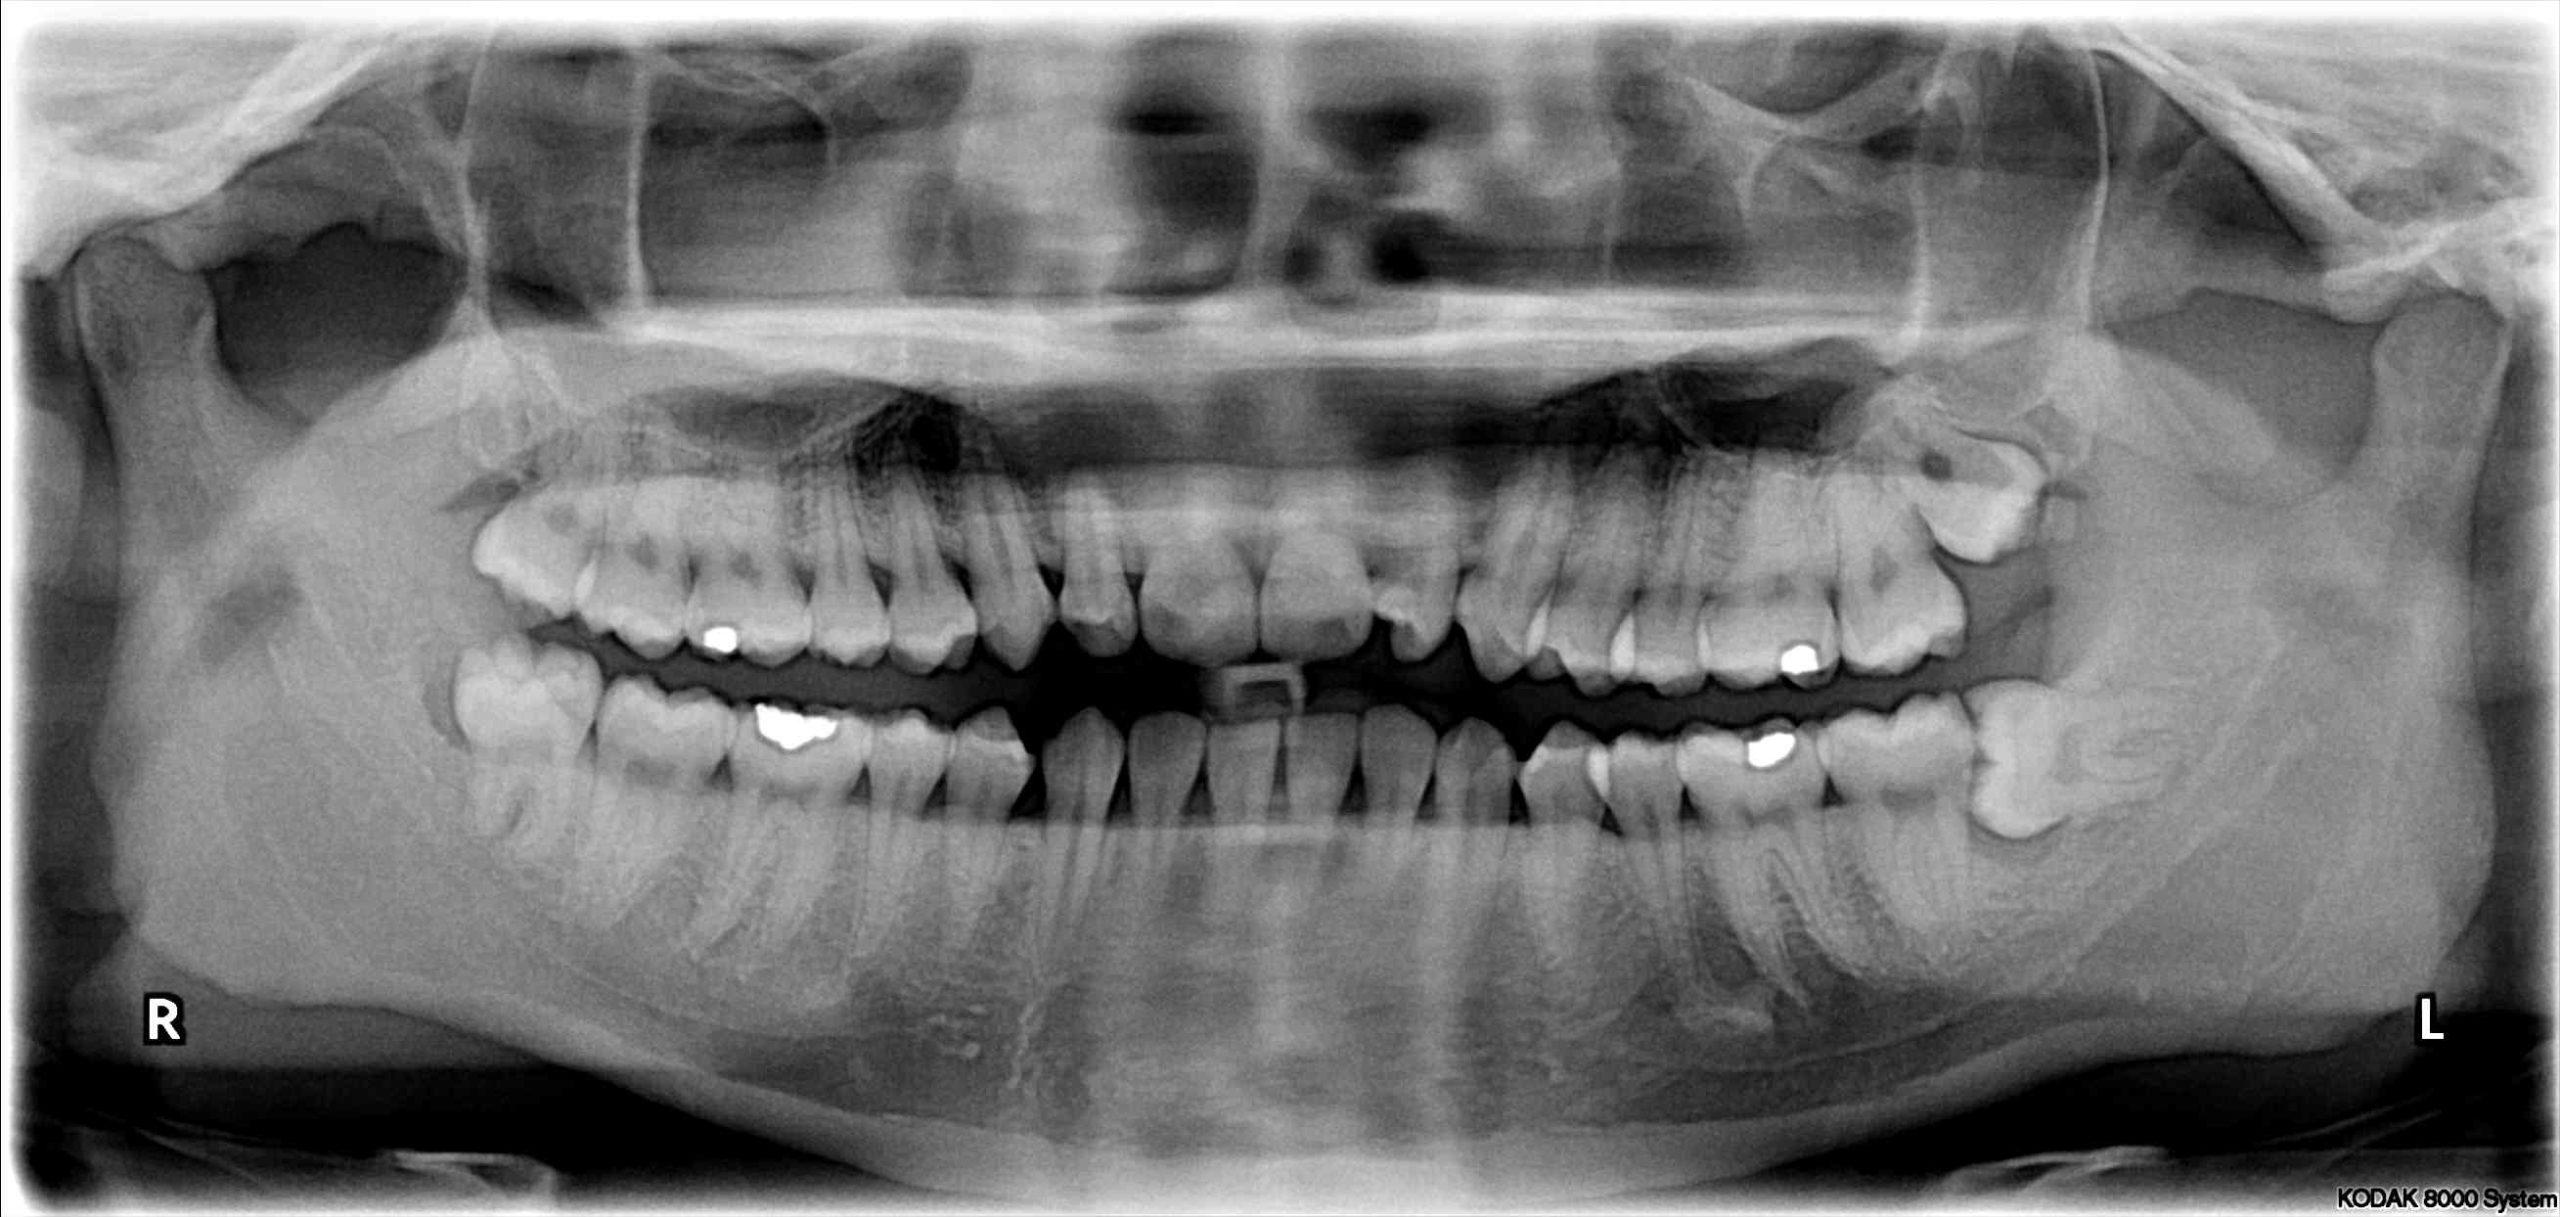 Wisdom Teeth: Can I Keep Mine?